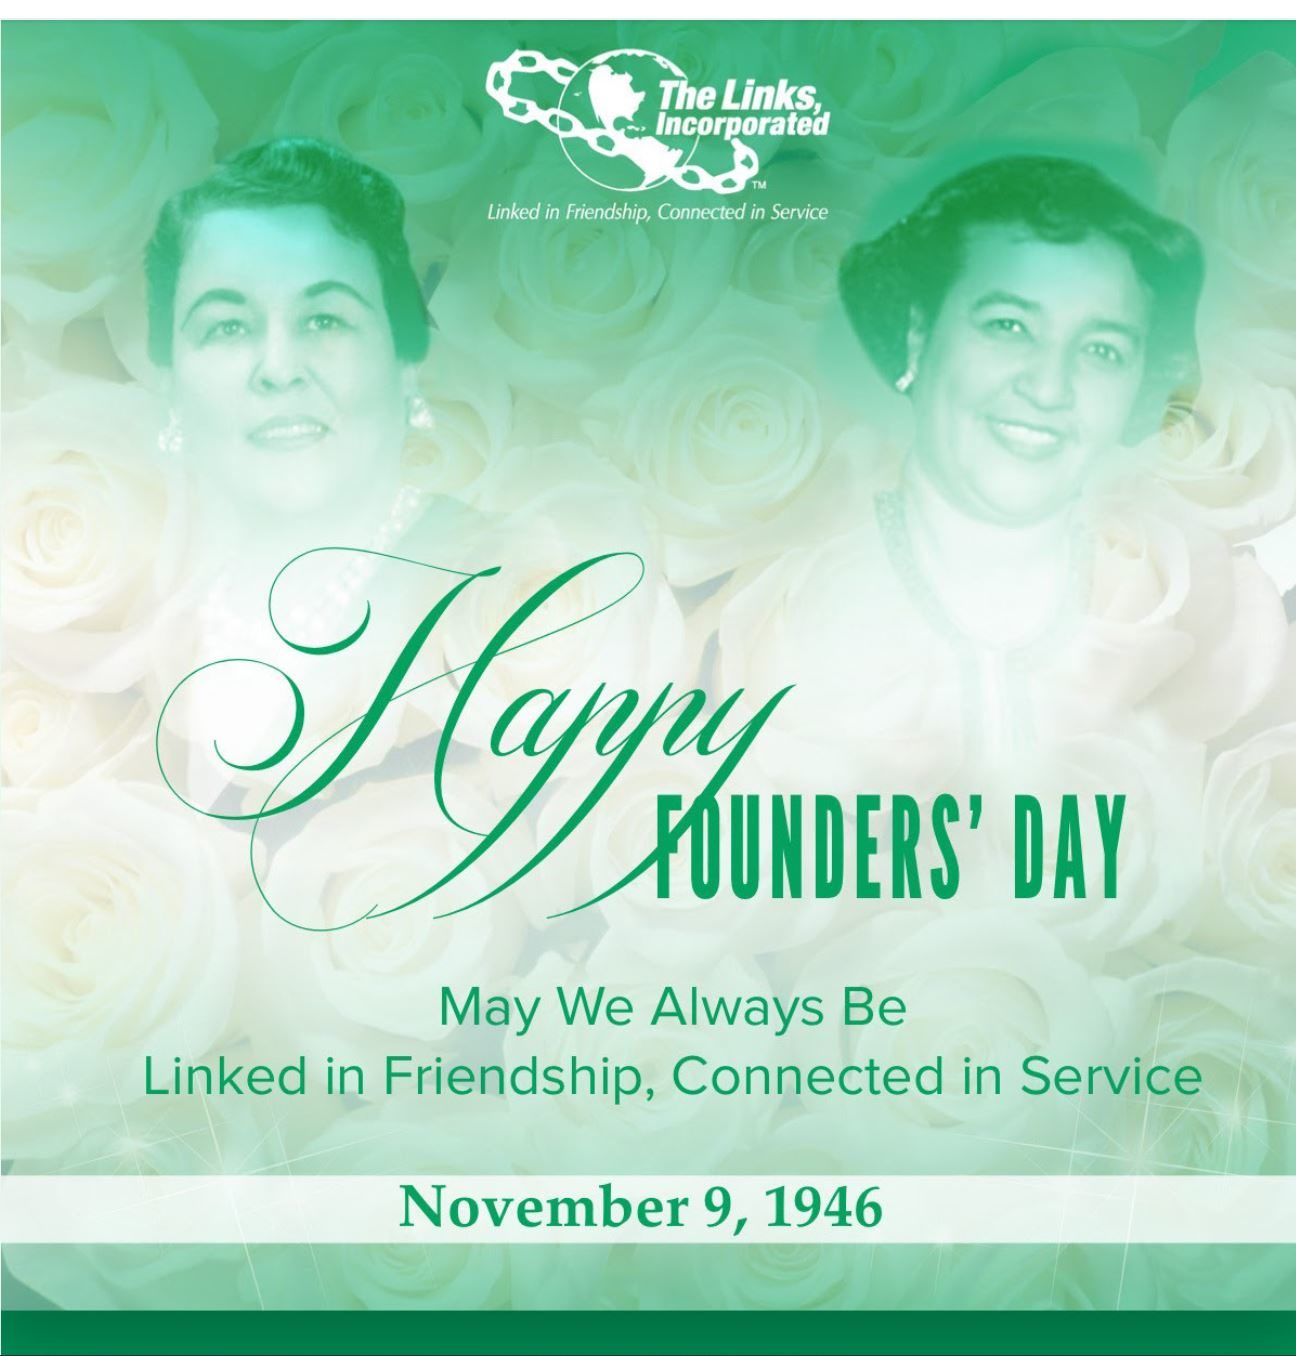 Happy Founders Day Nov 9